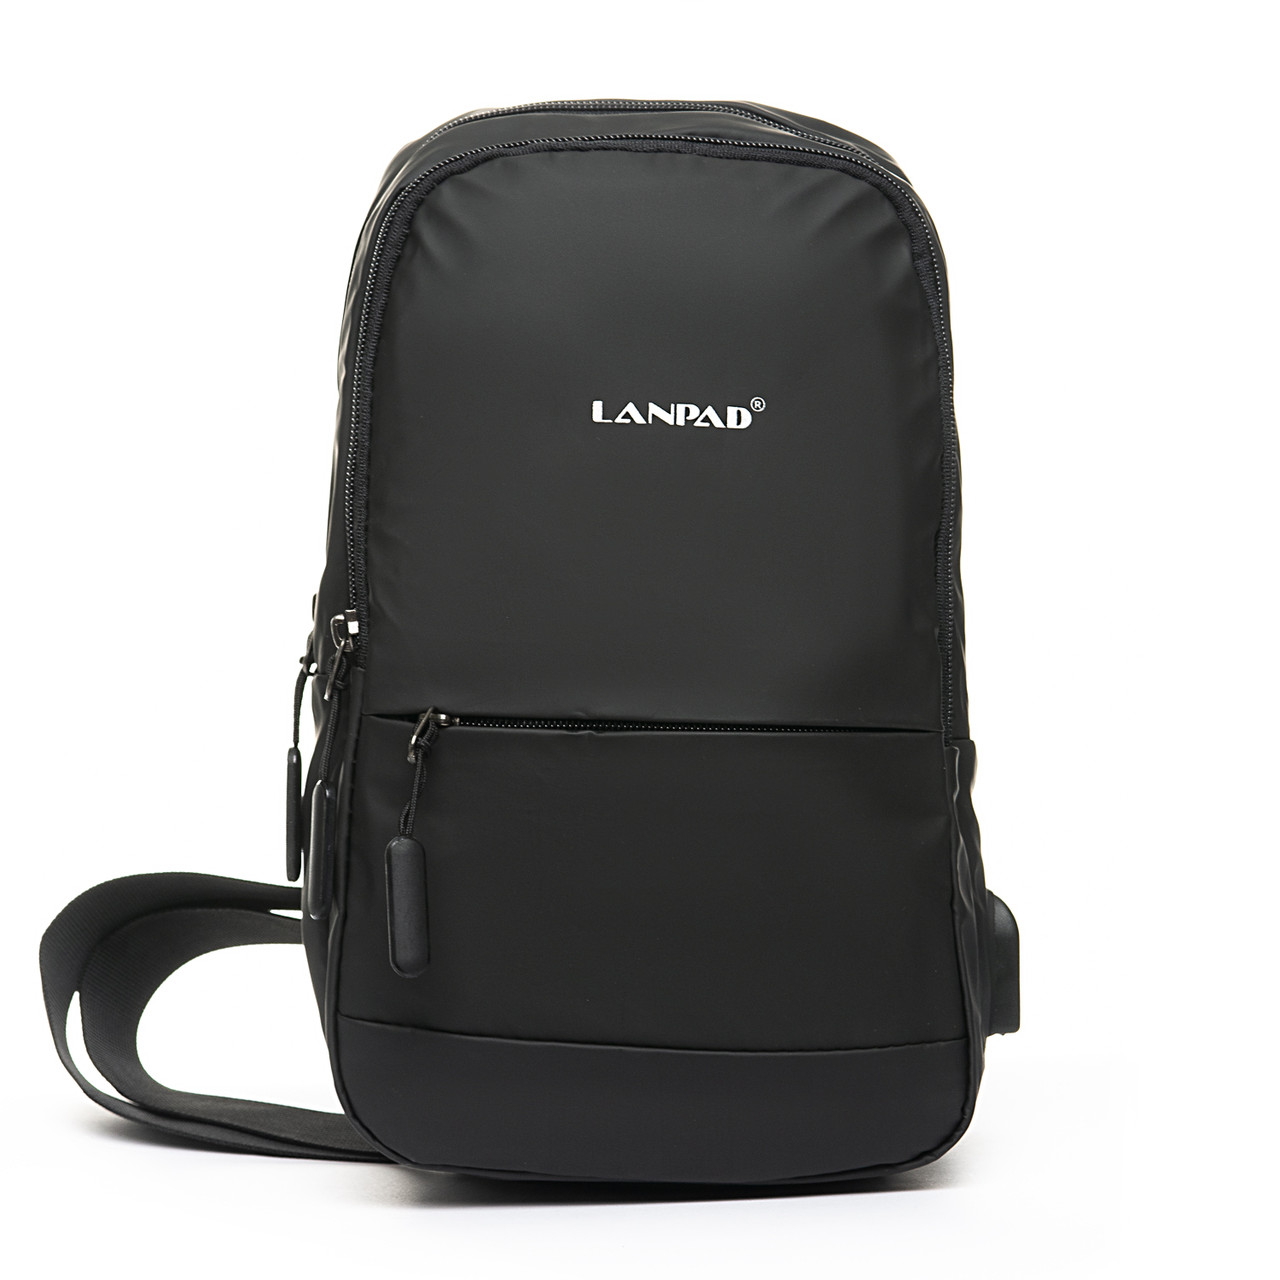 Мужская сумка через плече Lanpad 18 x 30 x 10 см Черный (4066/1)